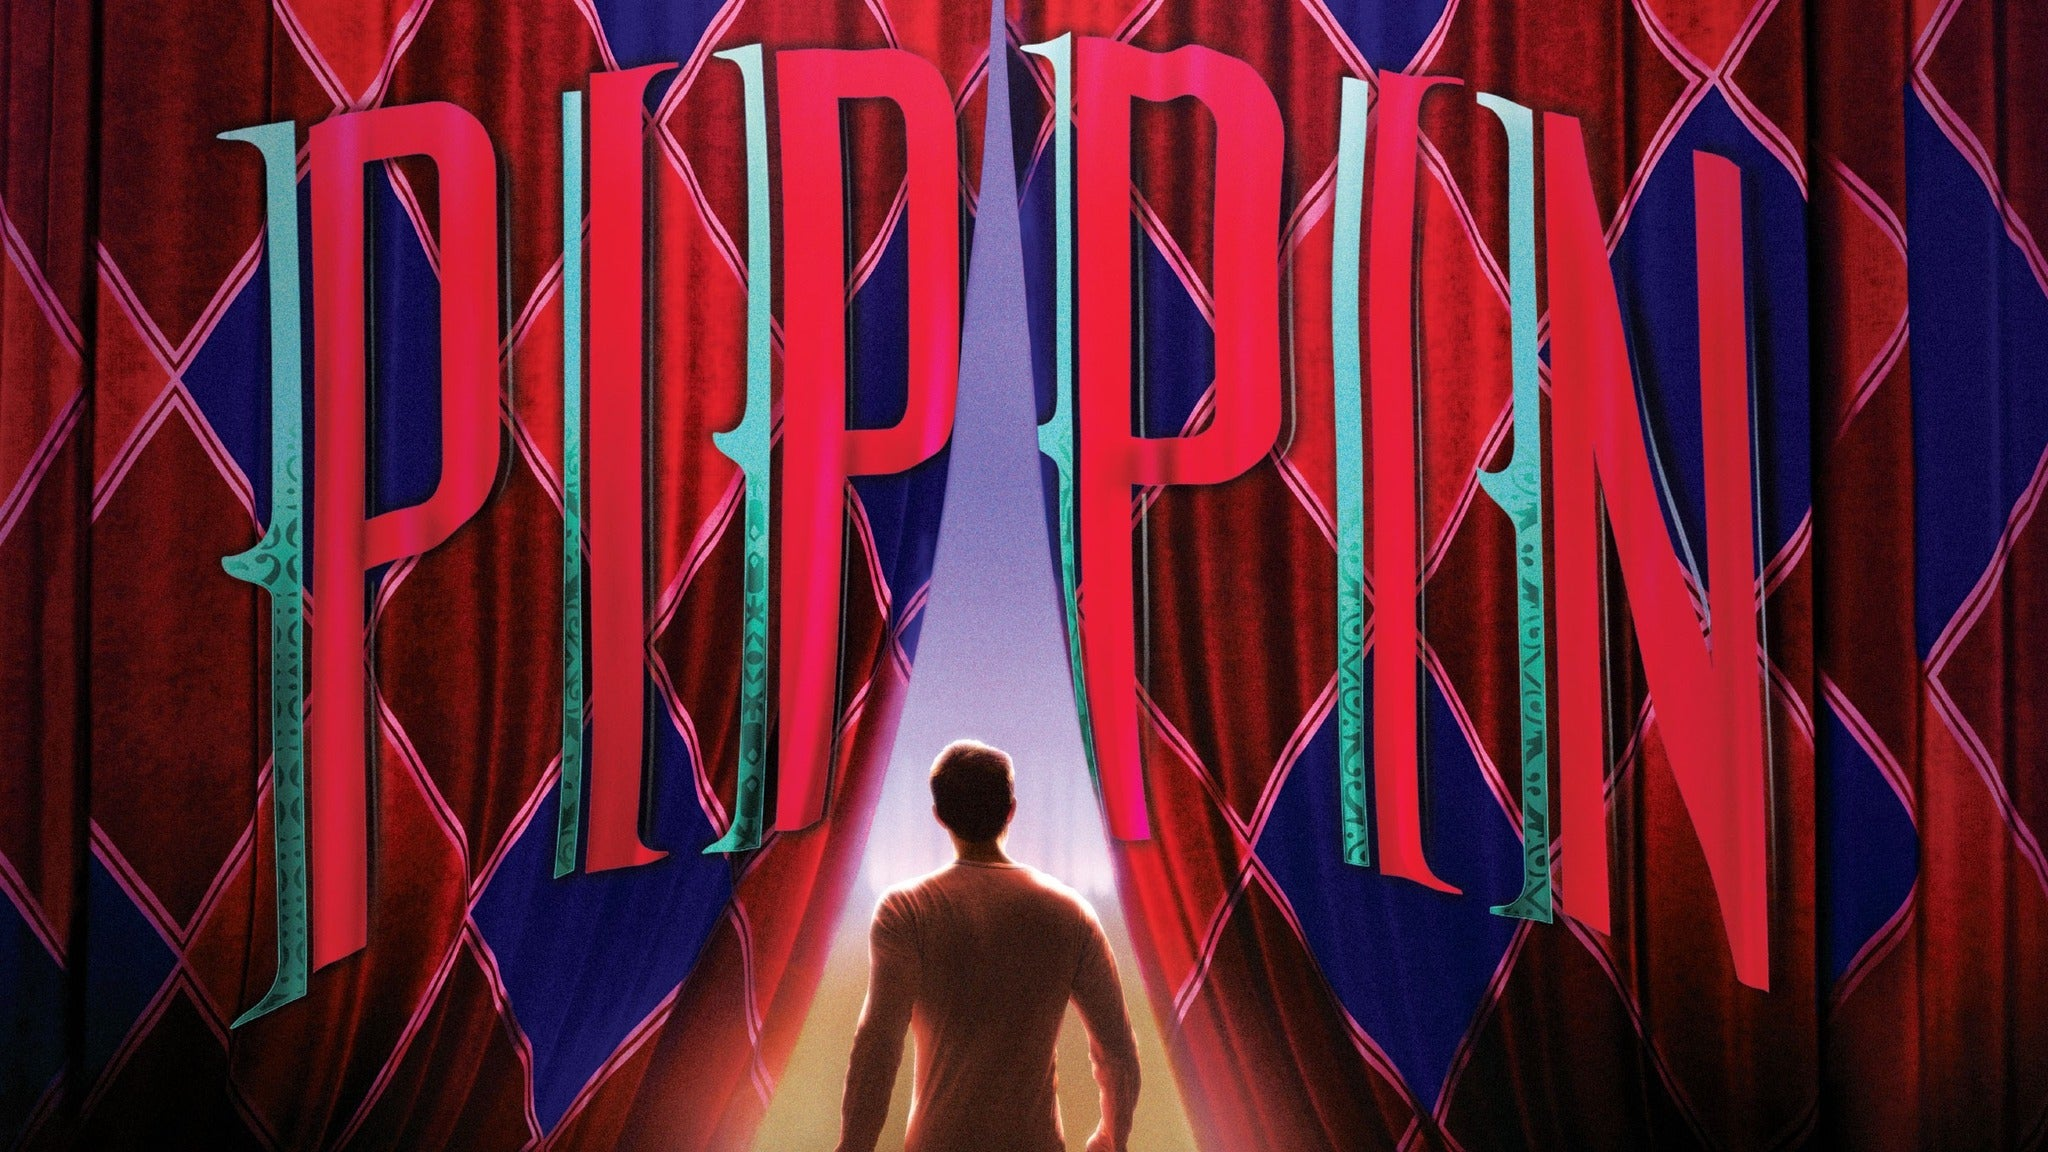 Pippin (Touring) at Lexington Opera House